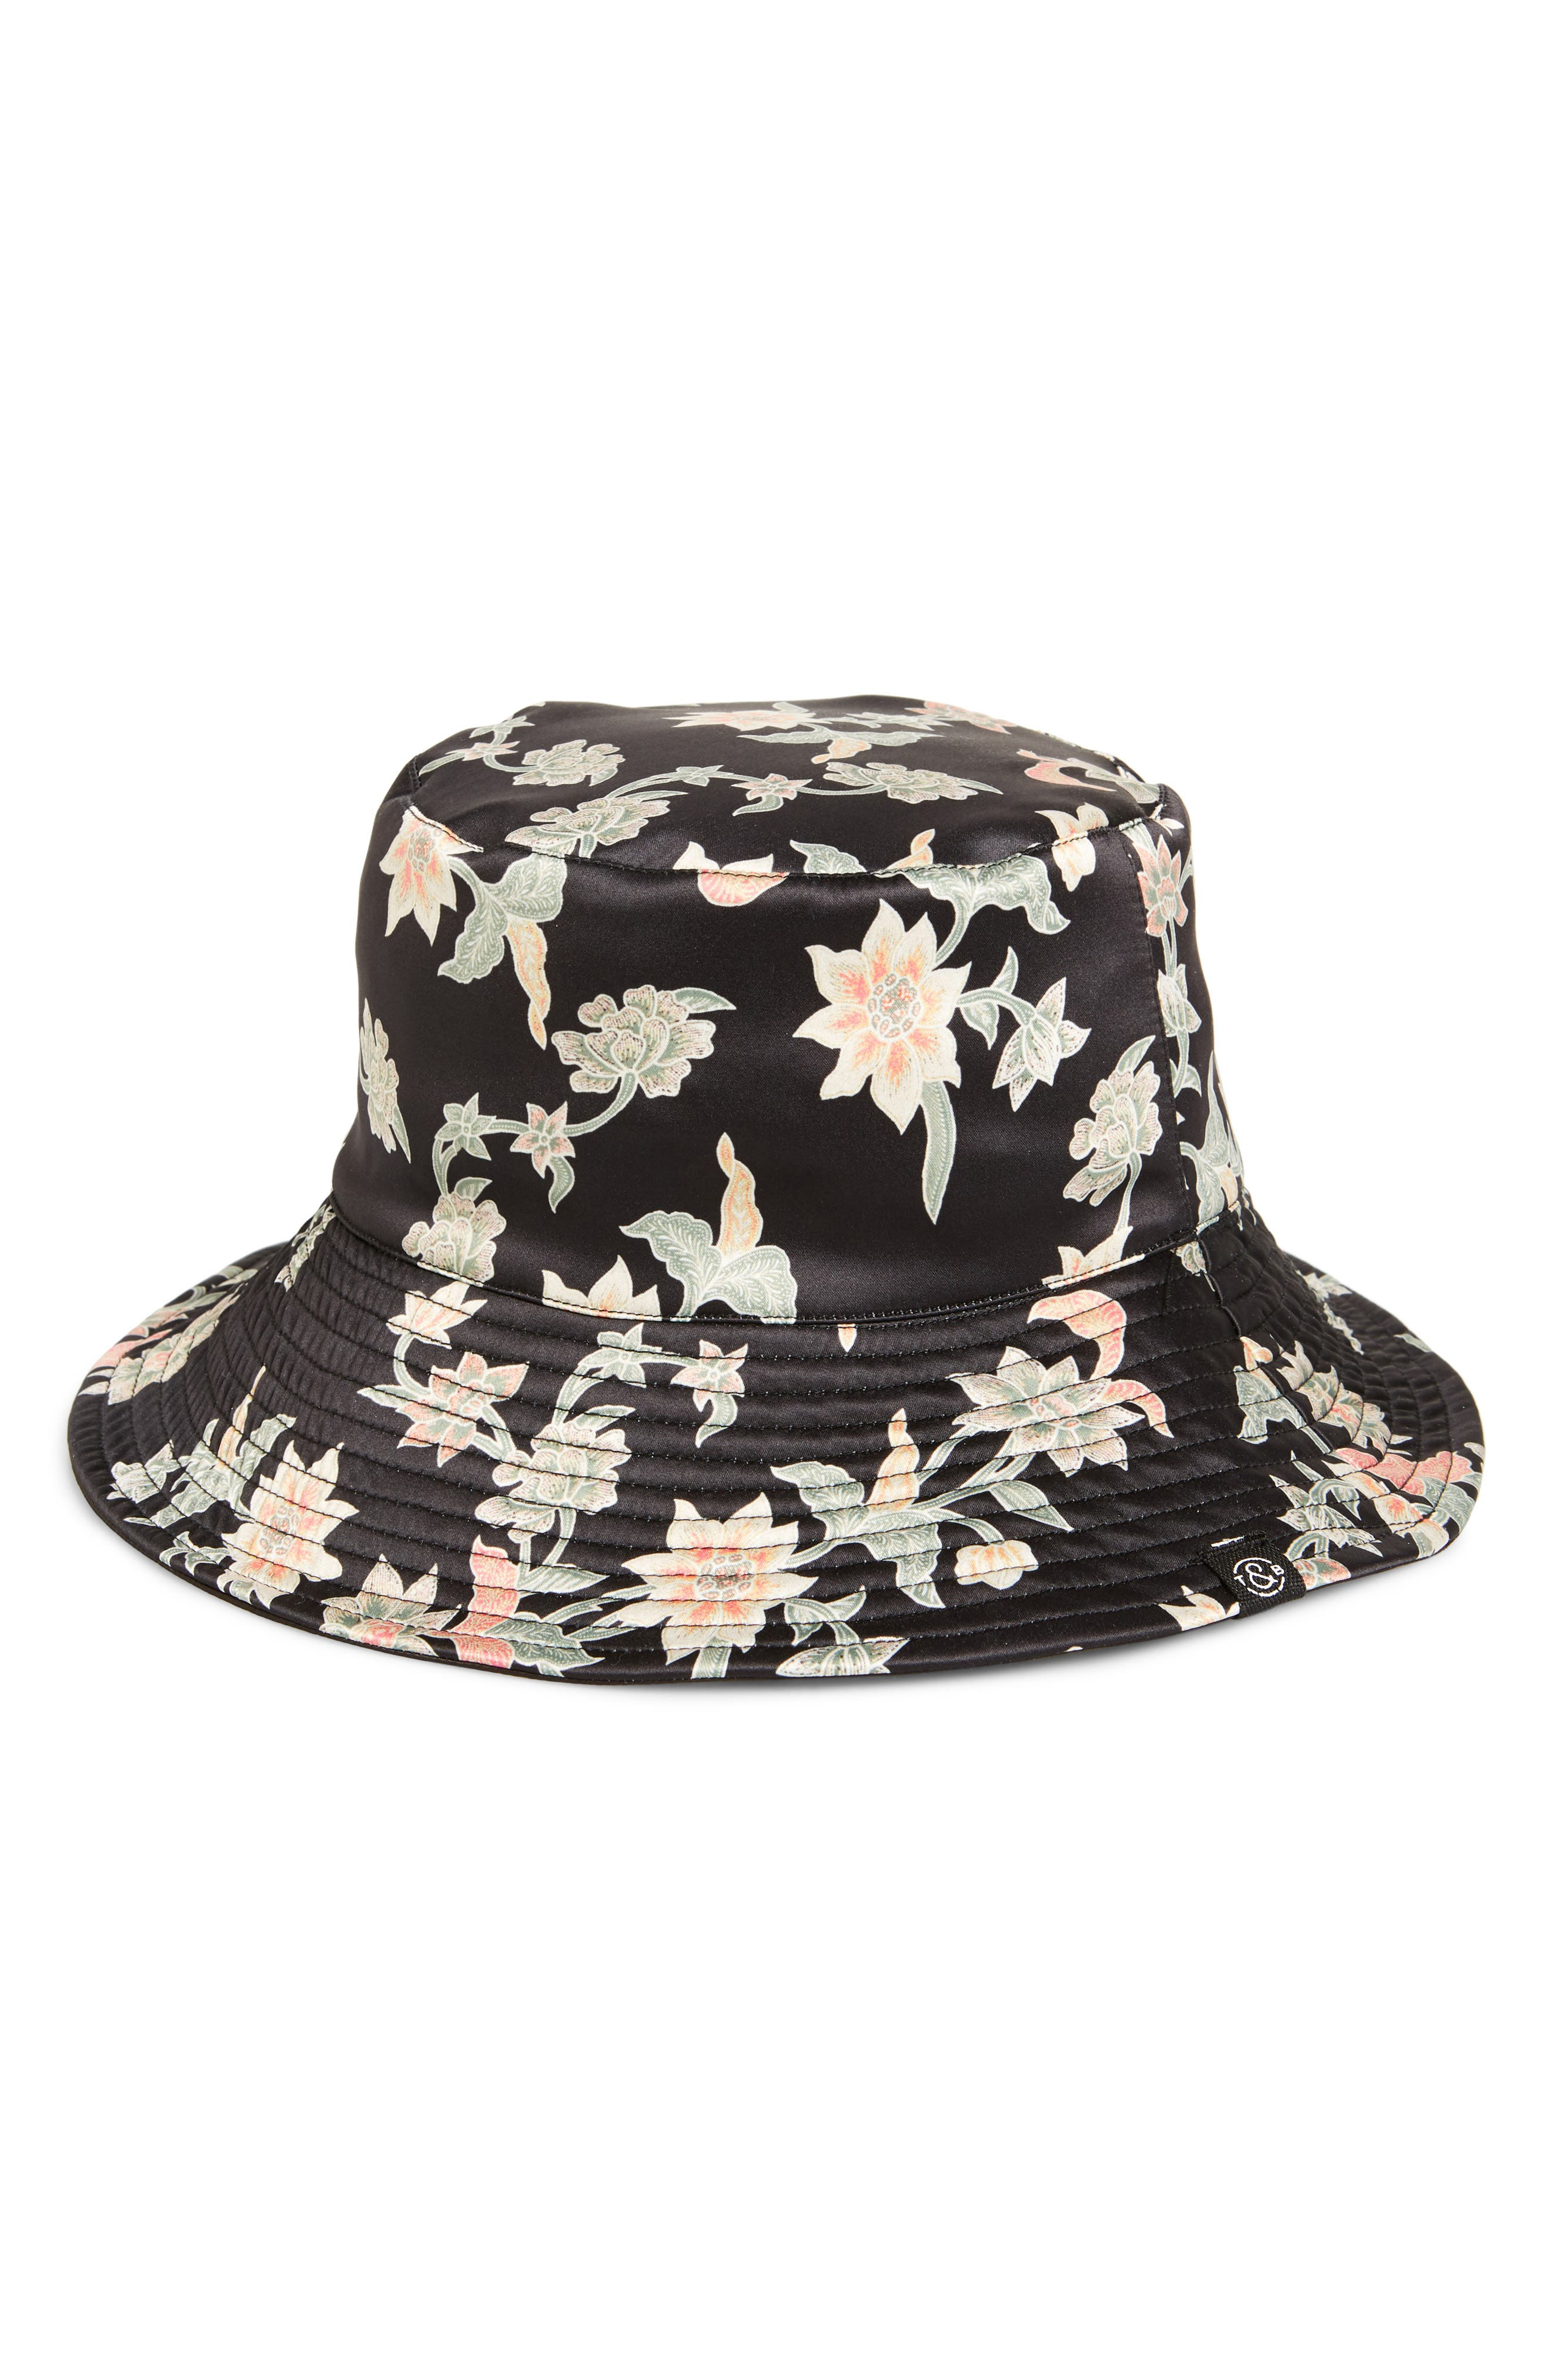 ab93d59ac1a2f1 Women's Hats Sale | Nordstrom